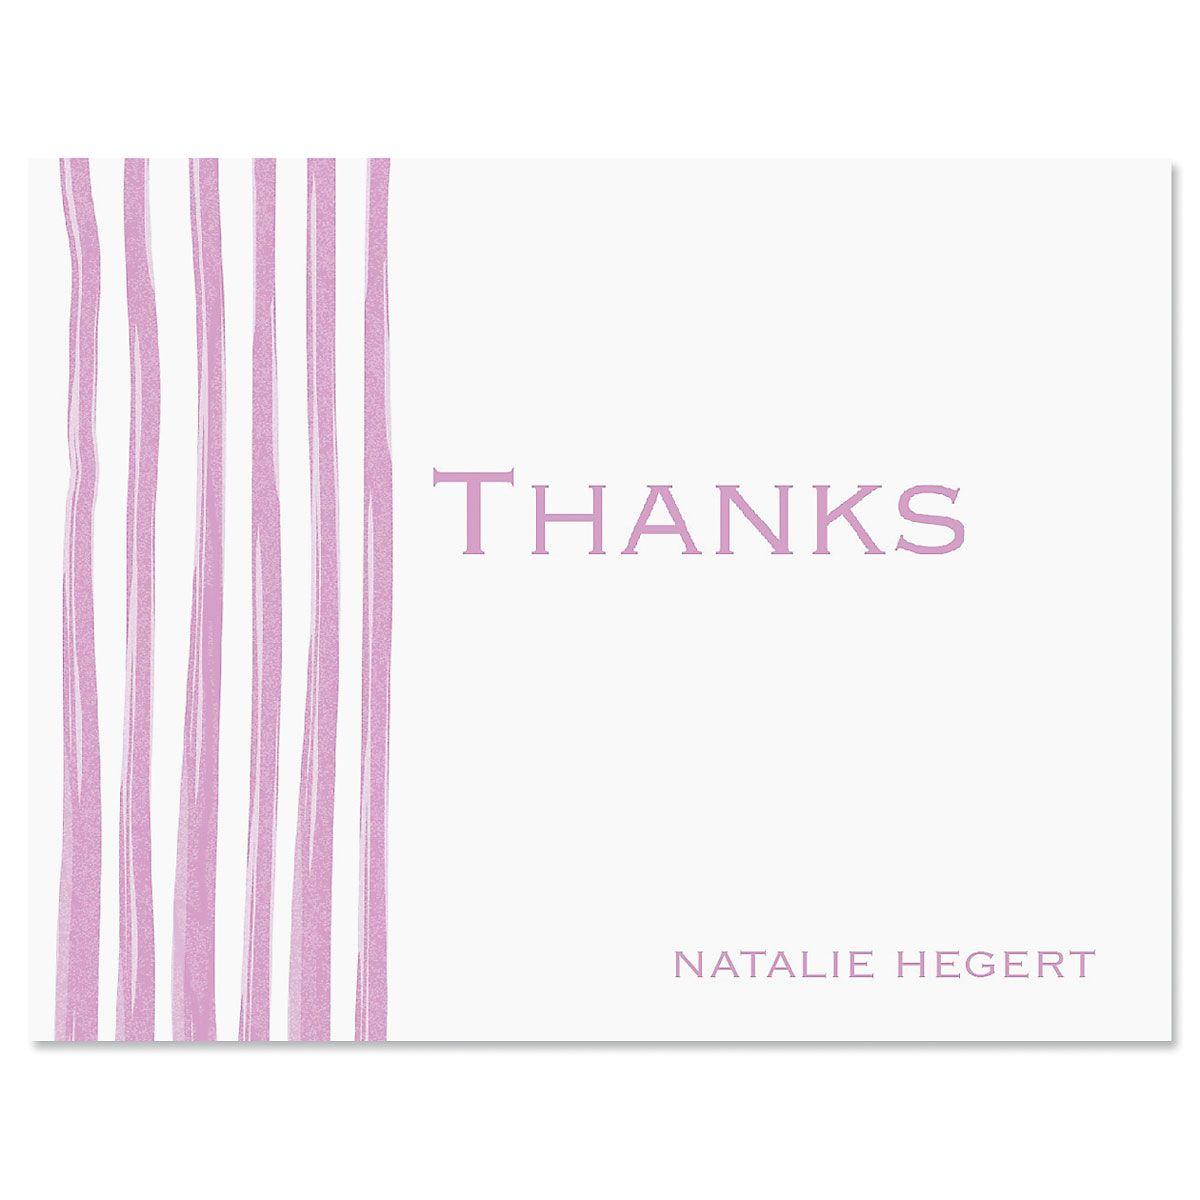 Sheer Delight Thank You Card-Lavender-609279A